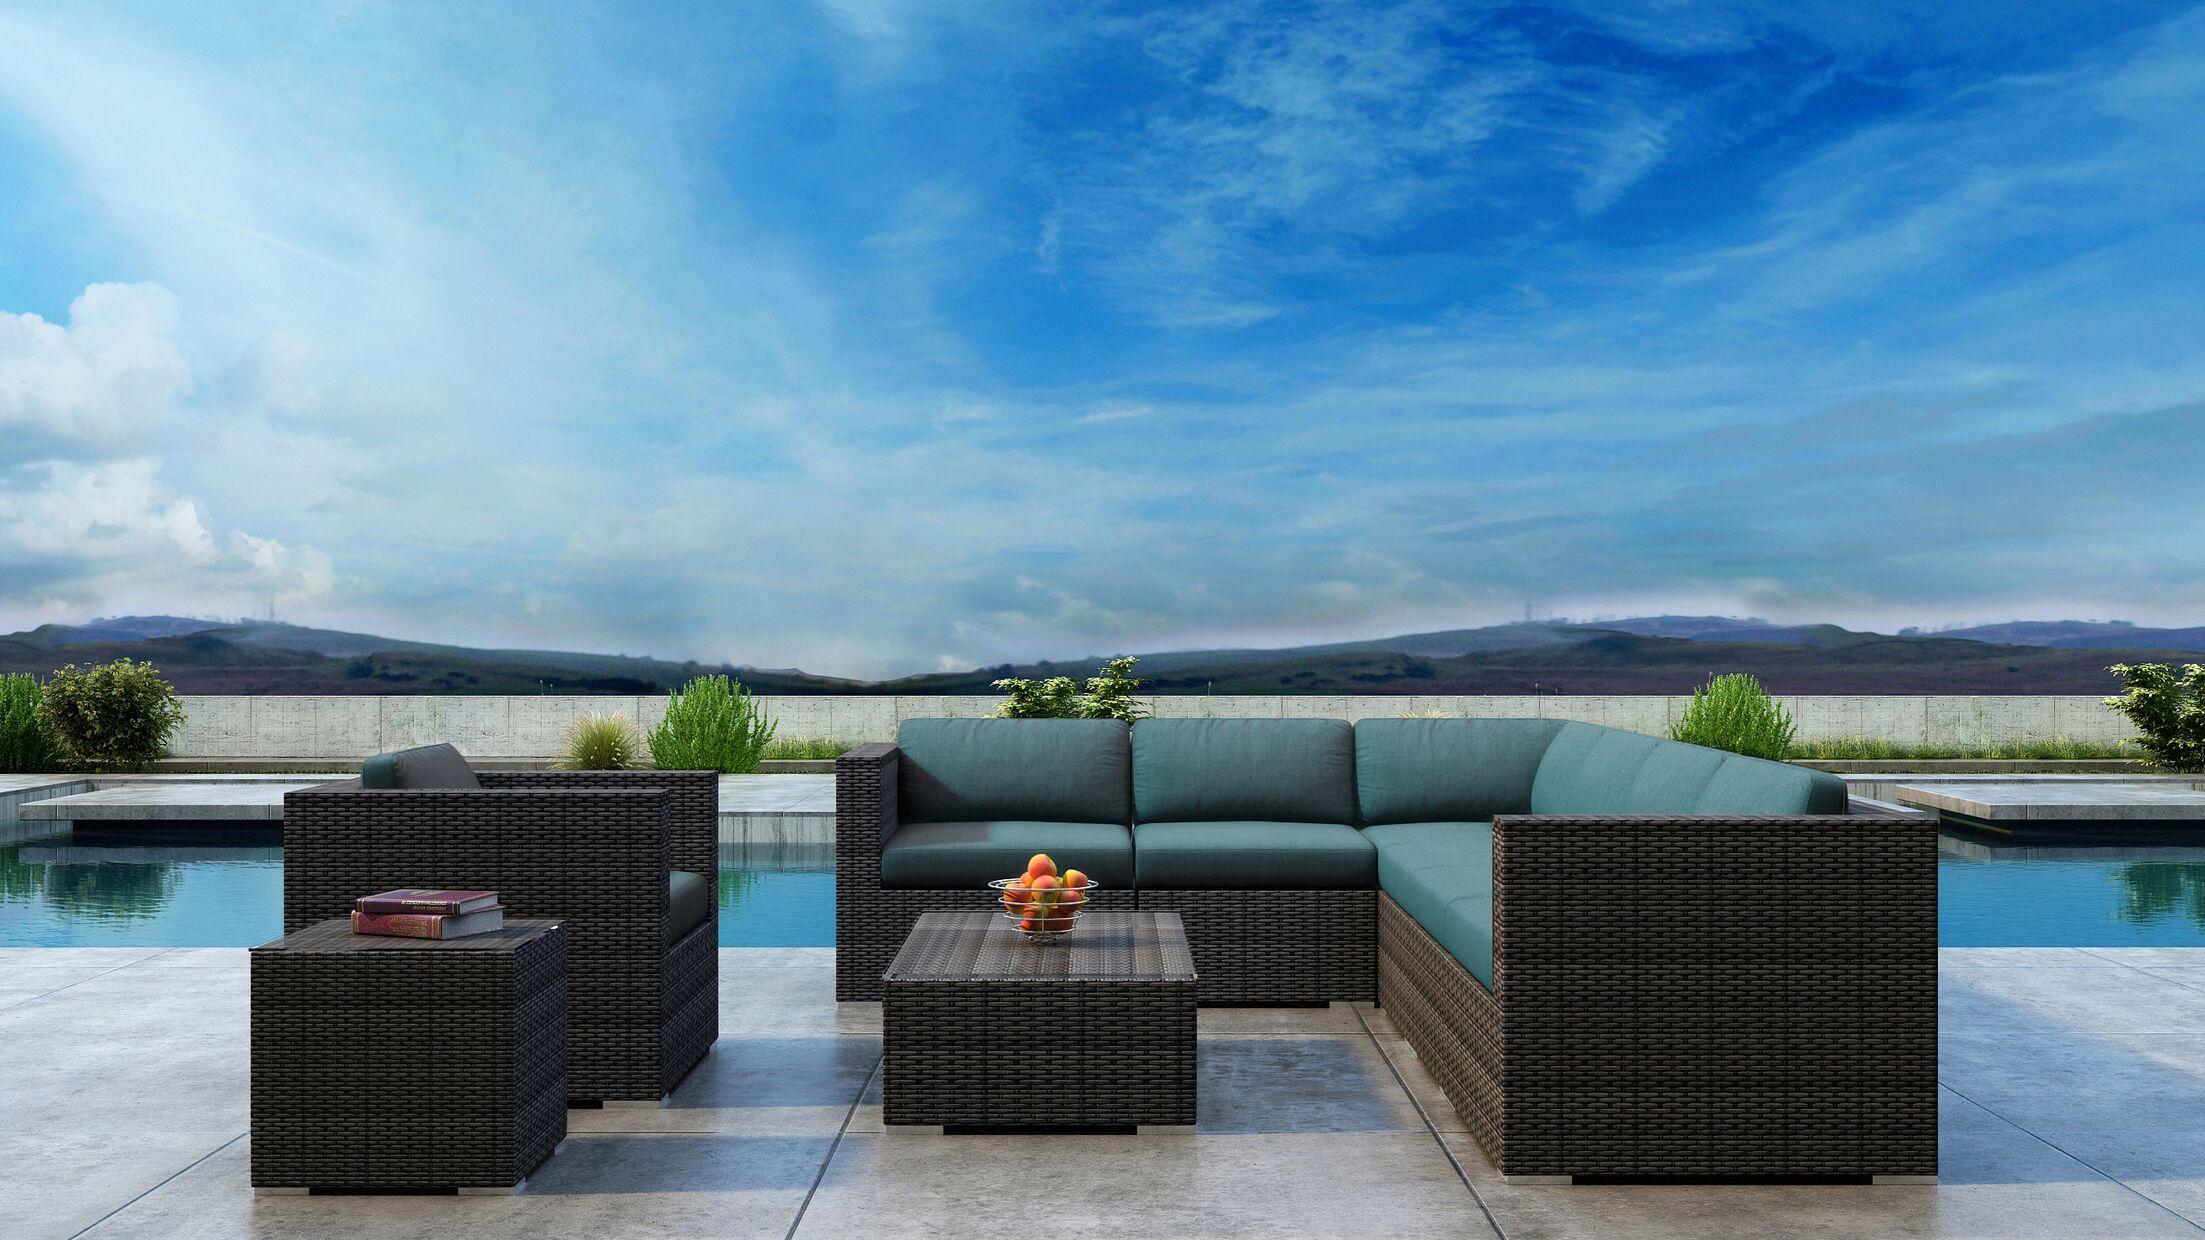 Gilleland 9 Piece Sectional Set with Sunbrella Cushion Cushion Color: Cast Lagoon